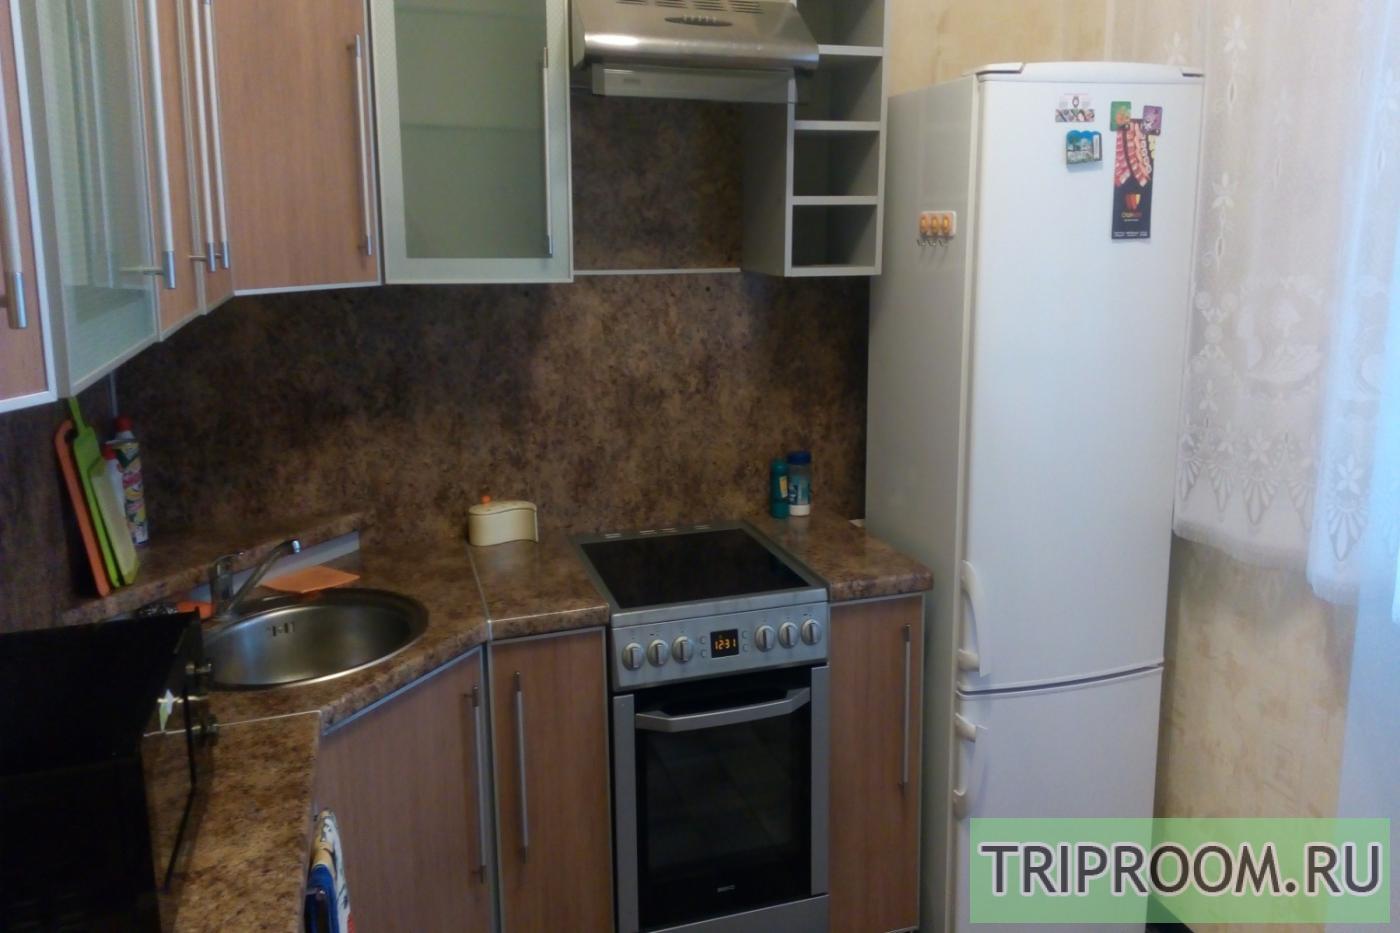 1-комнатная квартира посуточно (вариант № 35088), ул. Рязановское шоссе, фото № 4